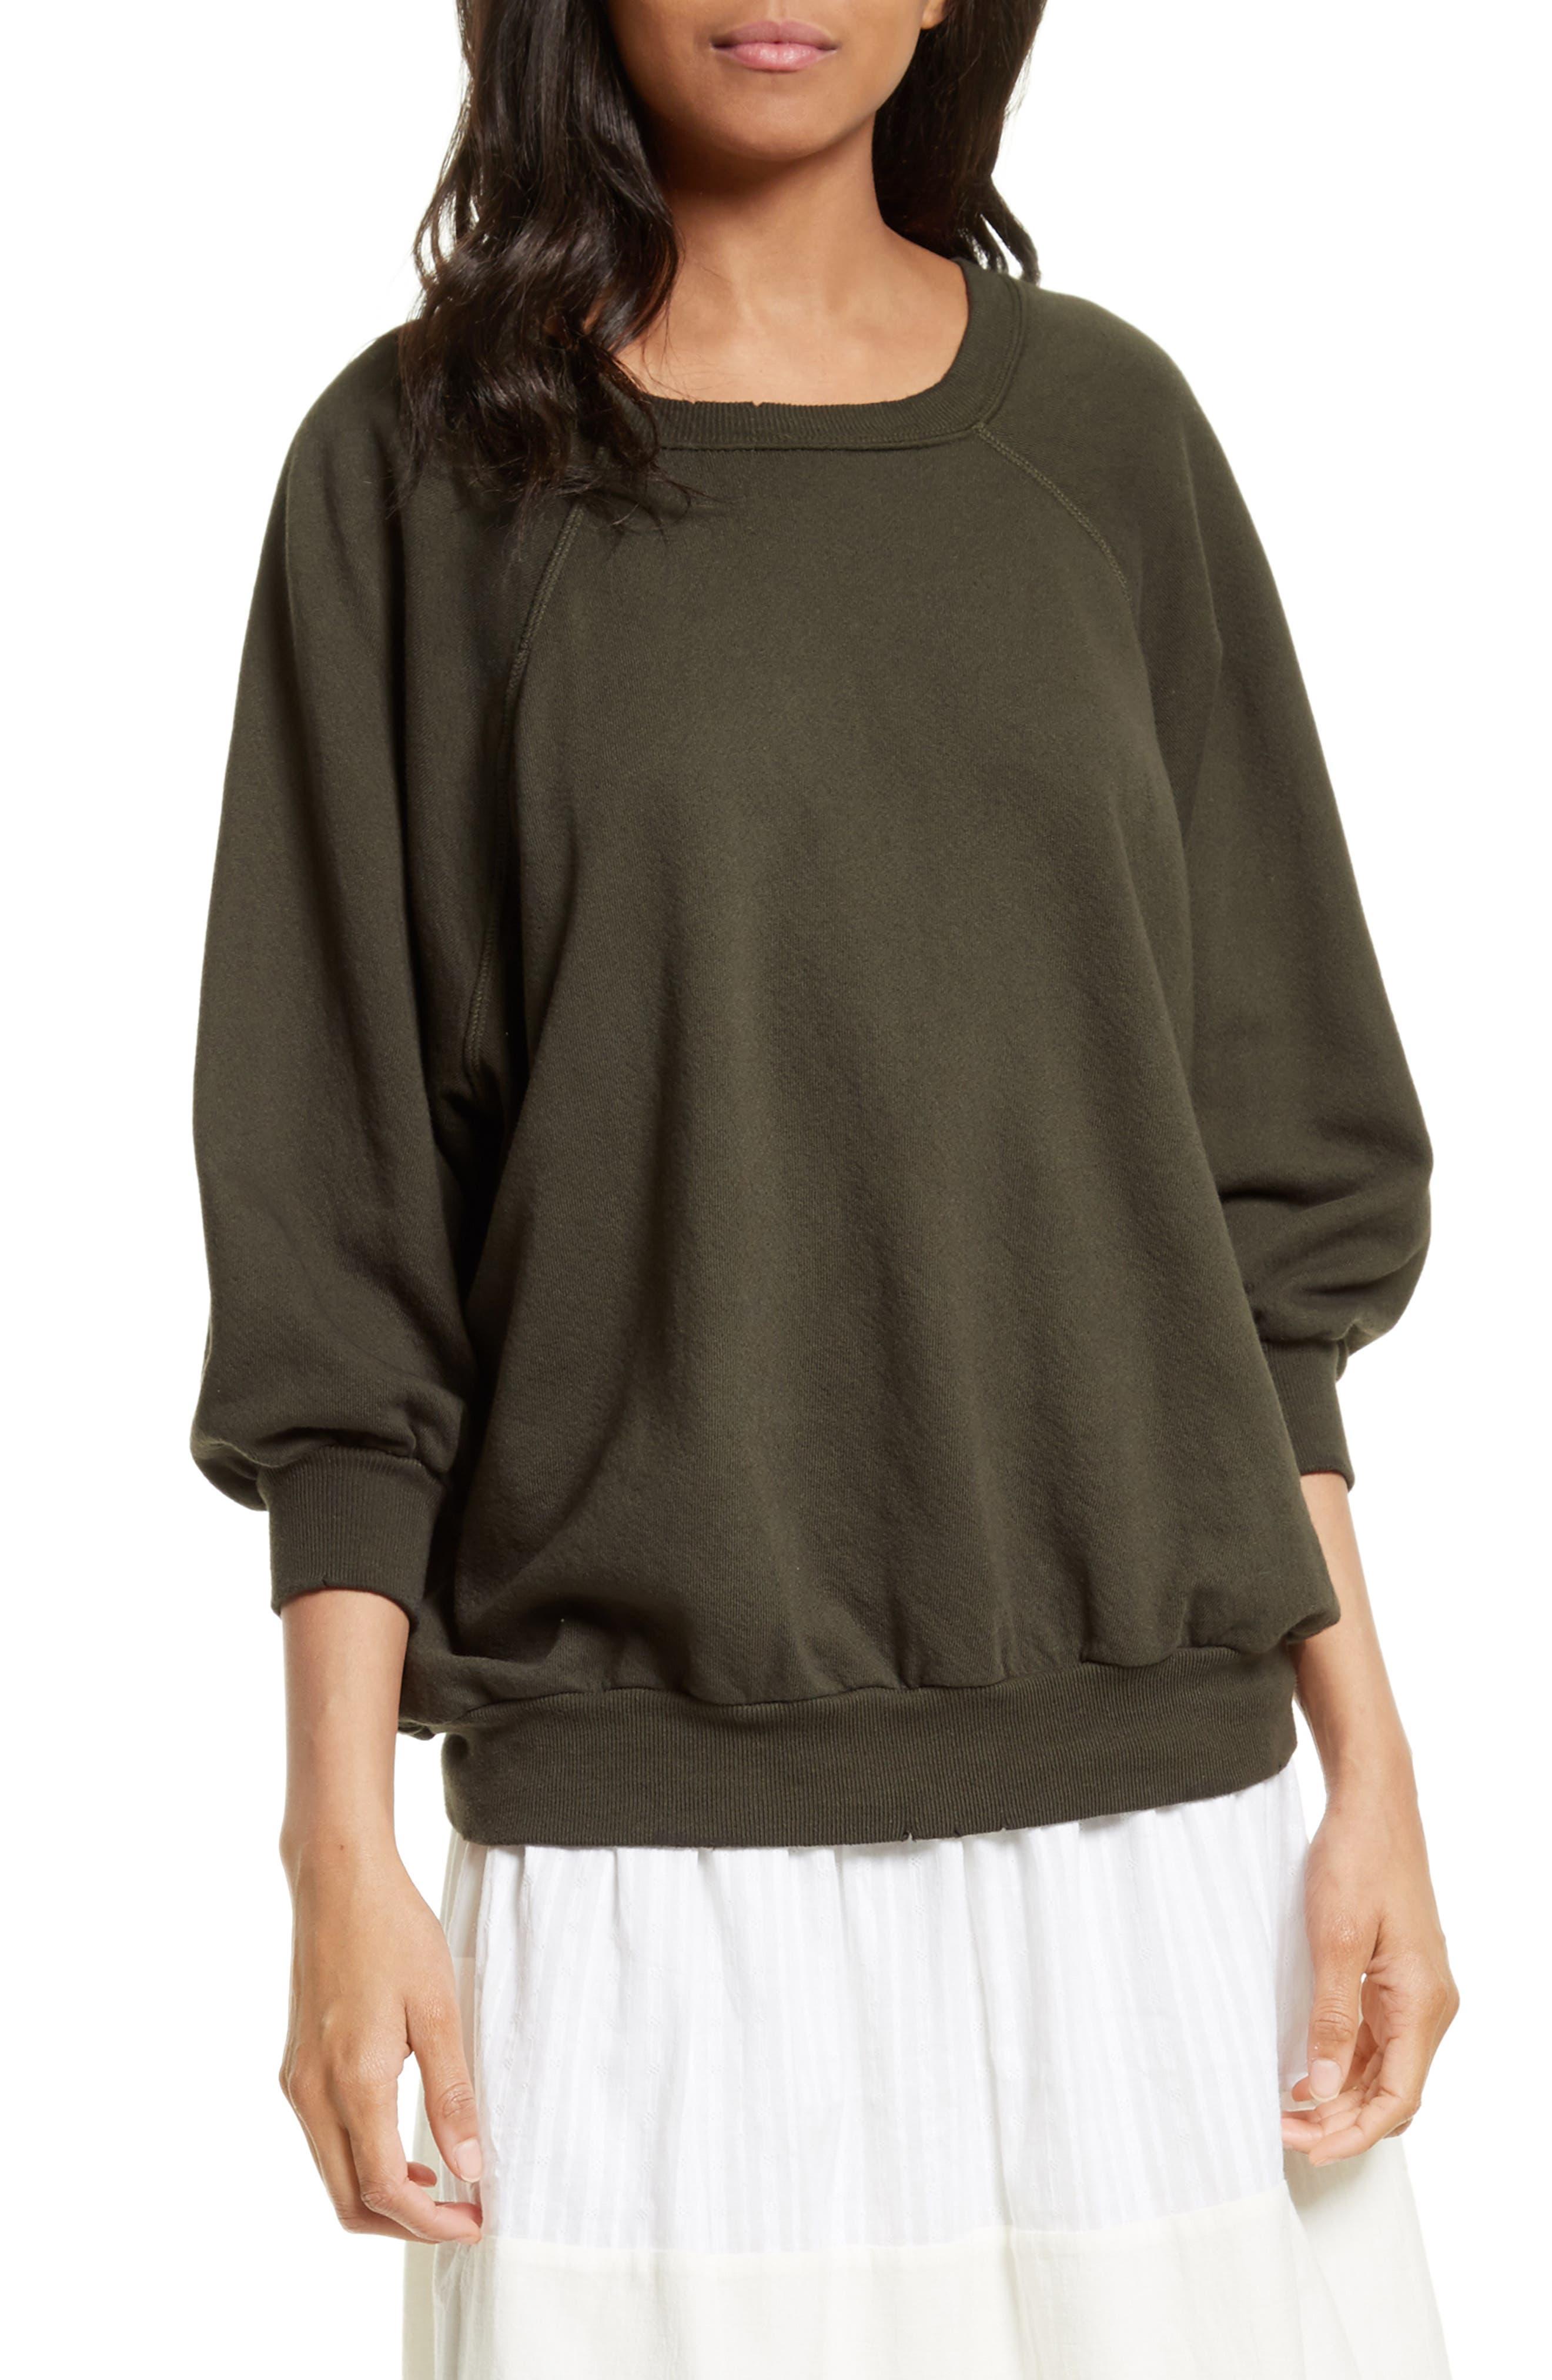 THE GREAT. The Bubble Sweatshirt